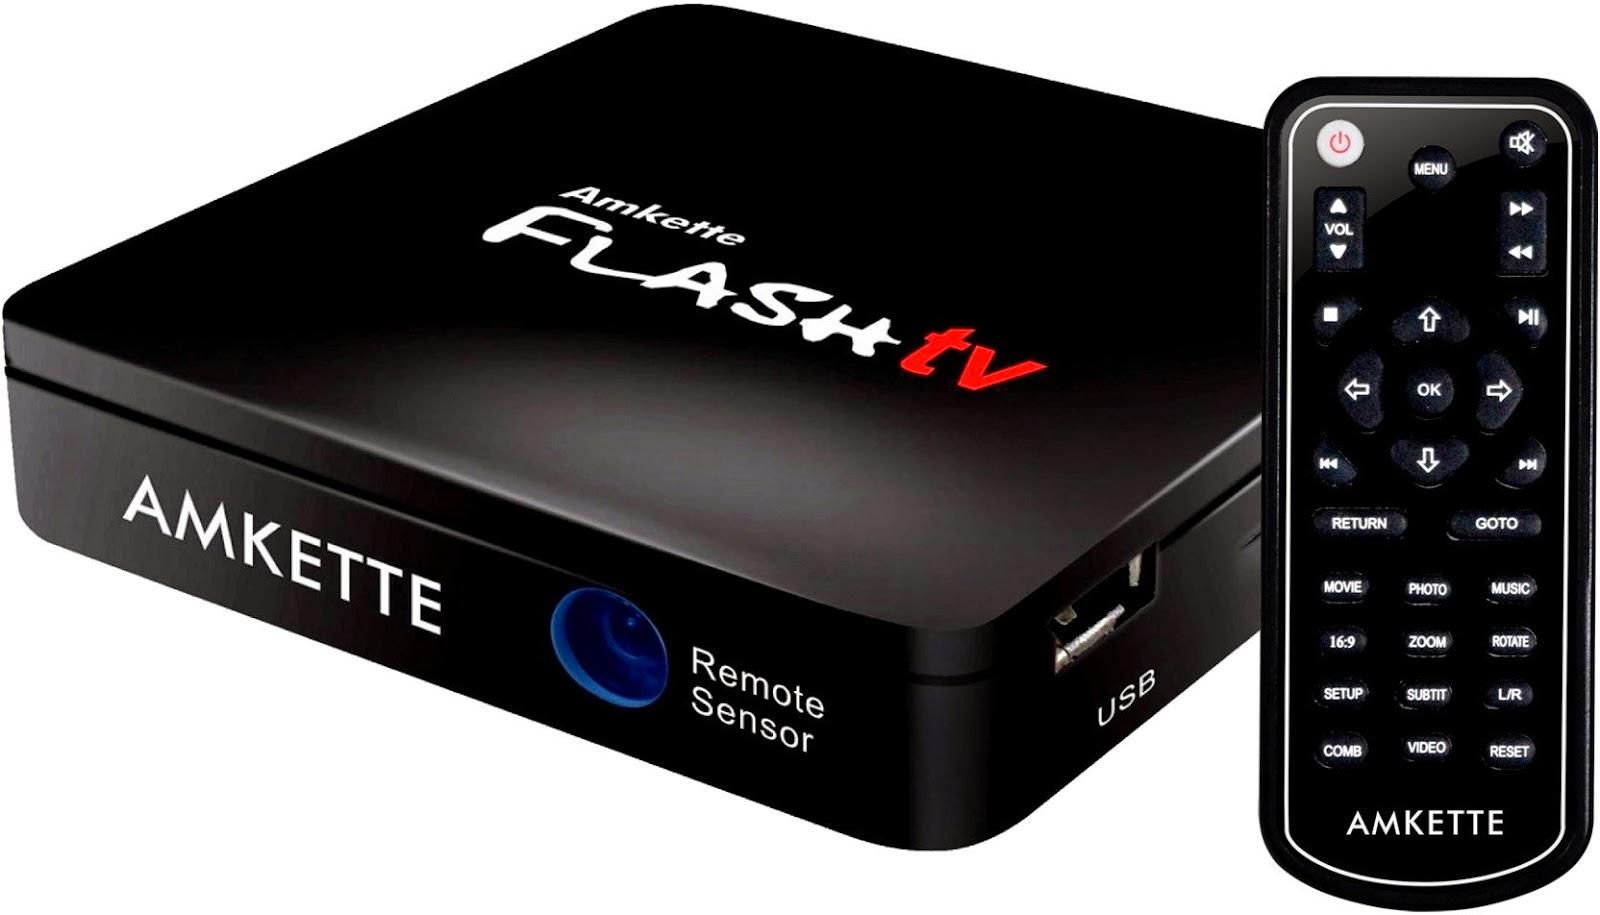 Amkette FlashTV HD